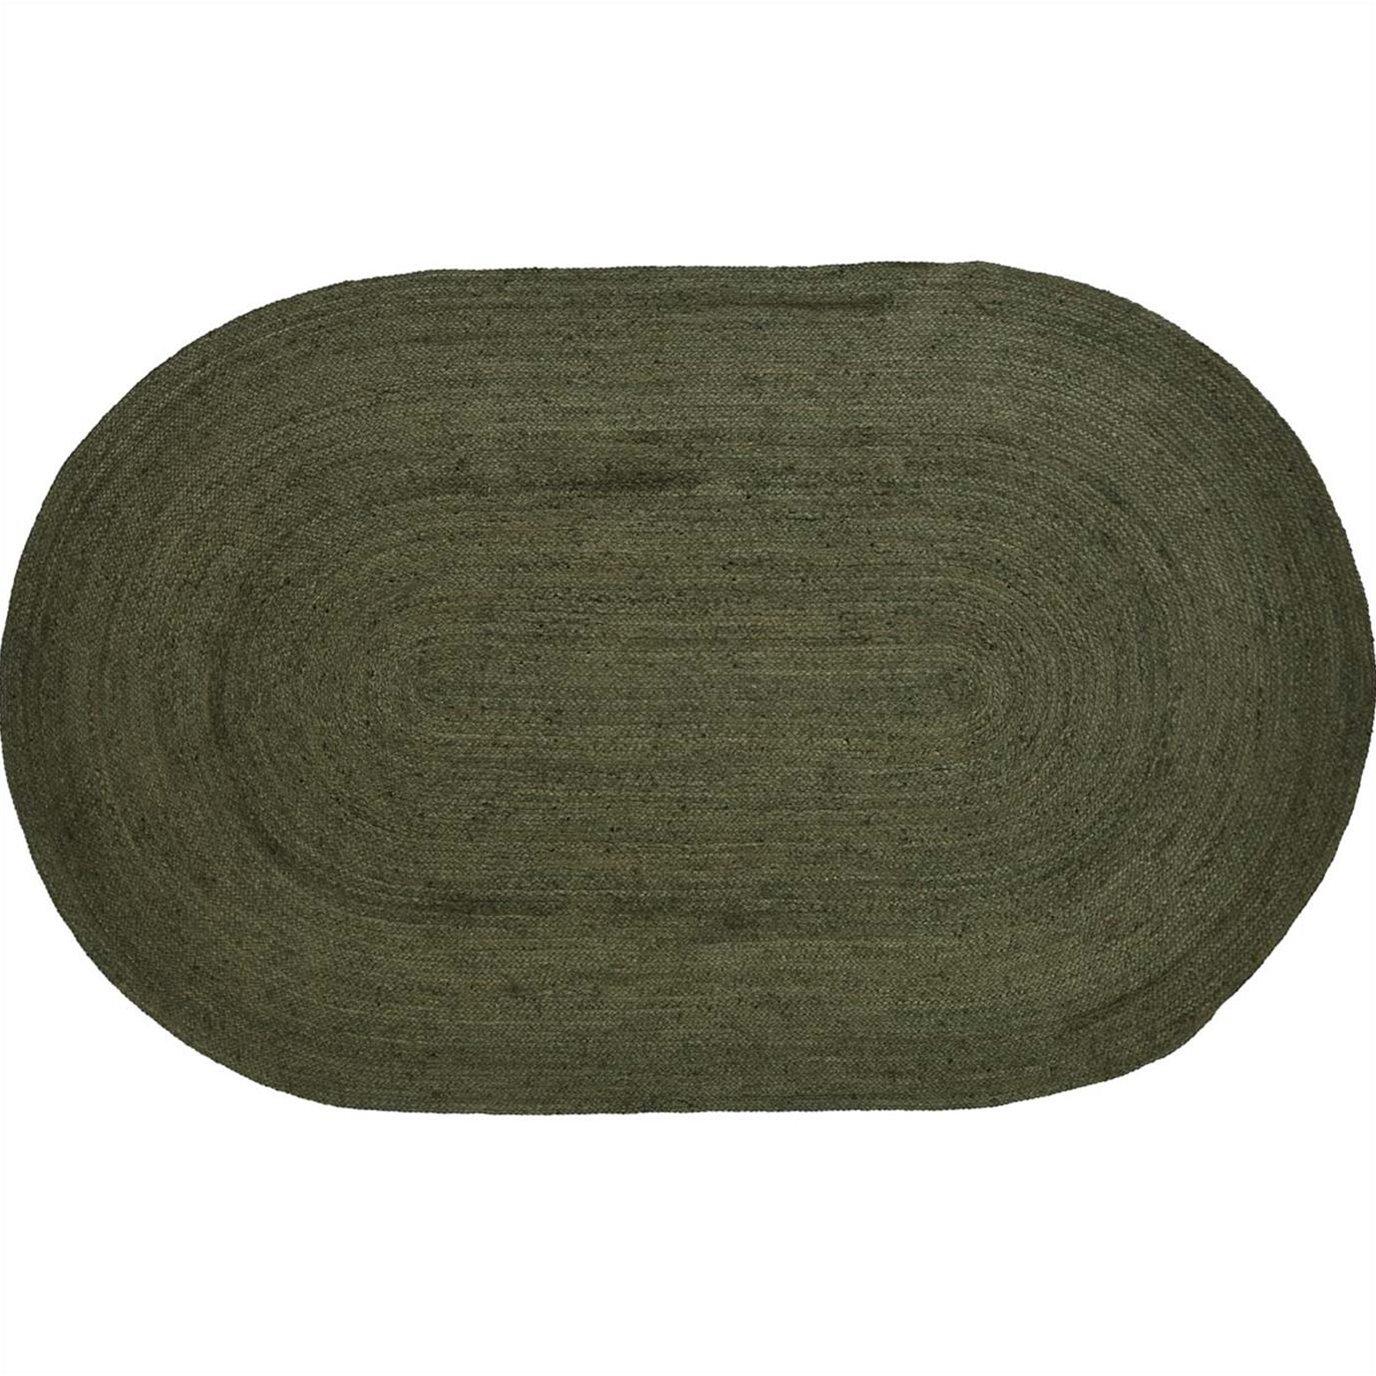 Cypress Jute Rug Oval 60x96